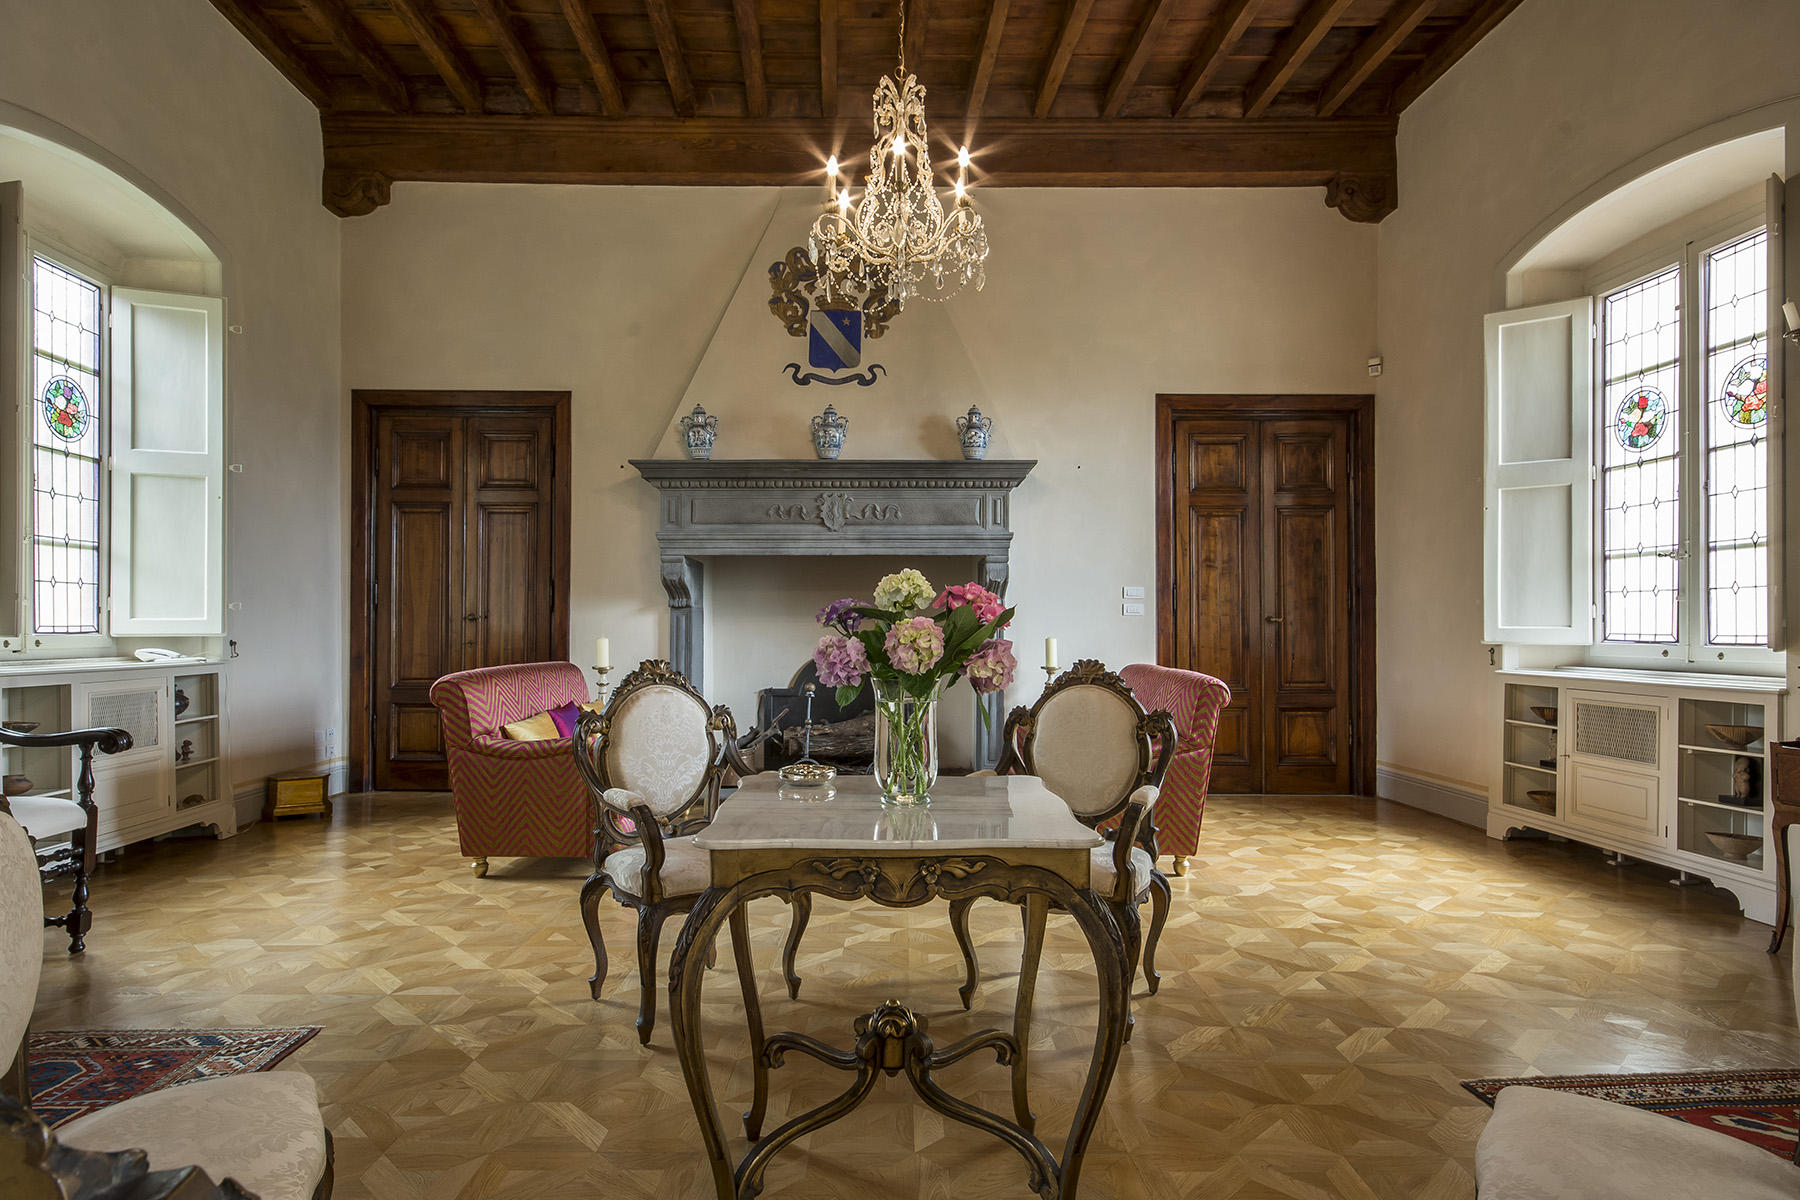 Villa in Vendita a Lucca: 5 locali, 1200 mq - Foto 7